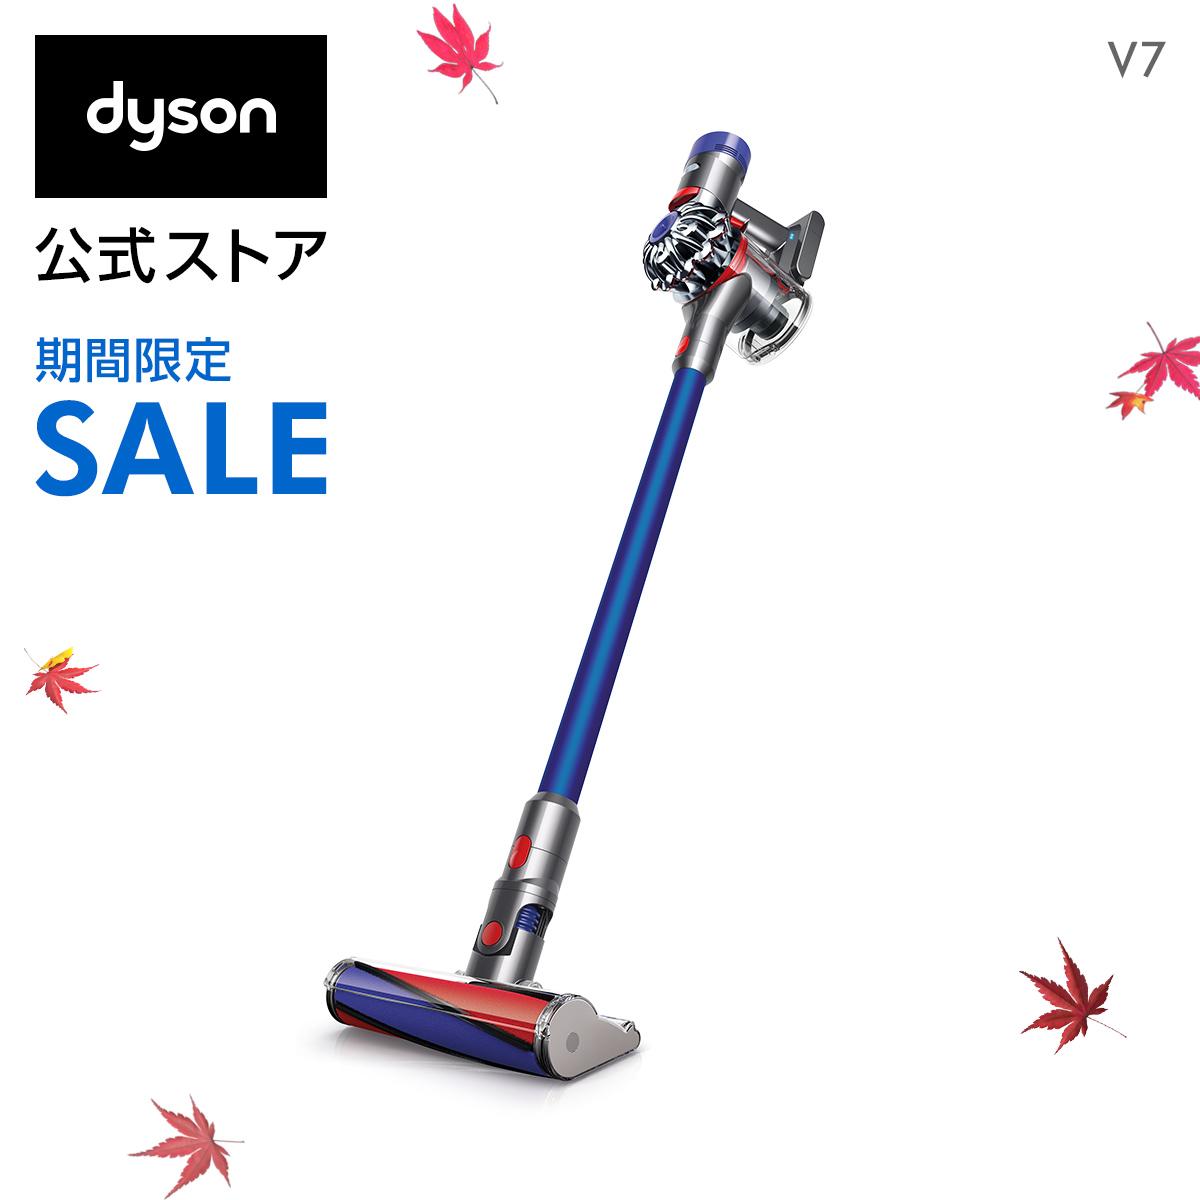 39%OFF【期間限定】11日1:59amまで!ダイソン Dyson V7 サイクロン式 コードレス掃除機 dyson SV11FFOLB 2018年モデル【在庫限り】